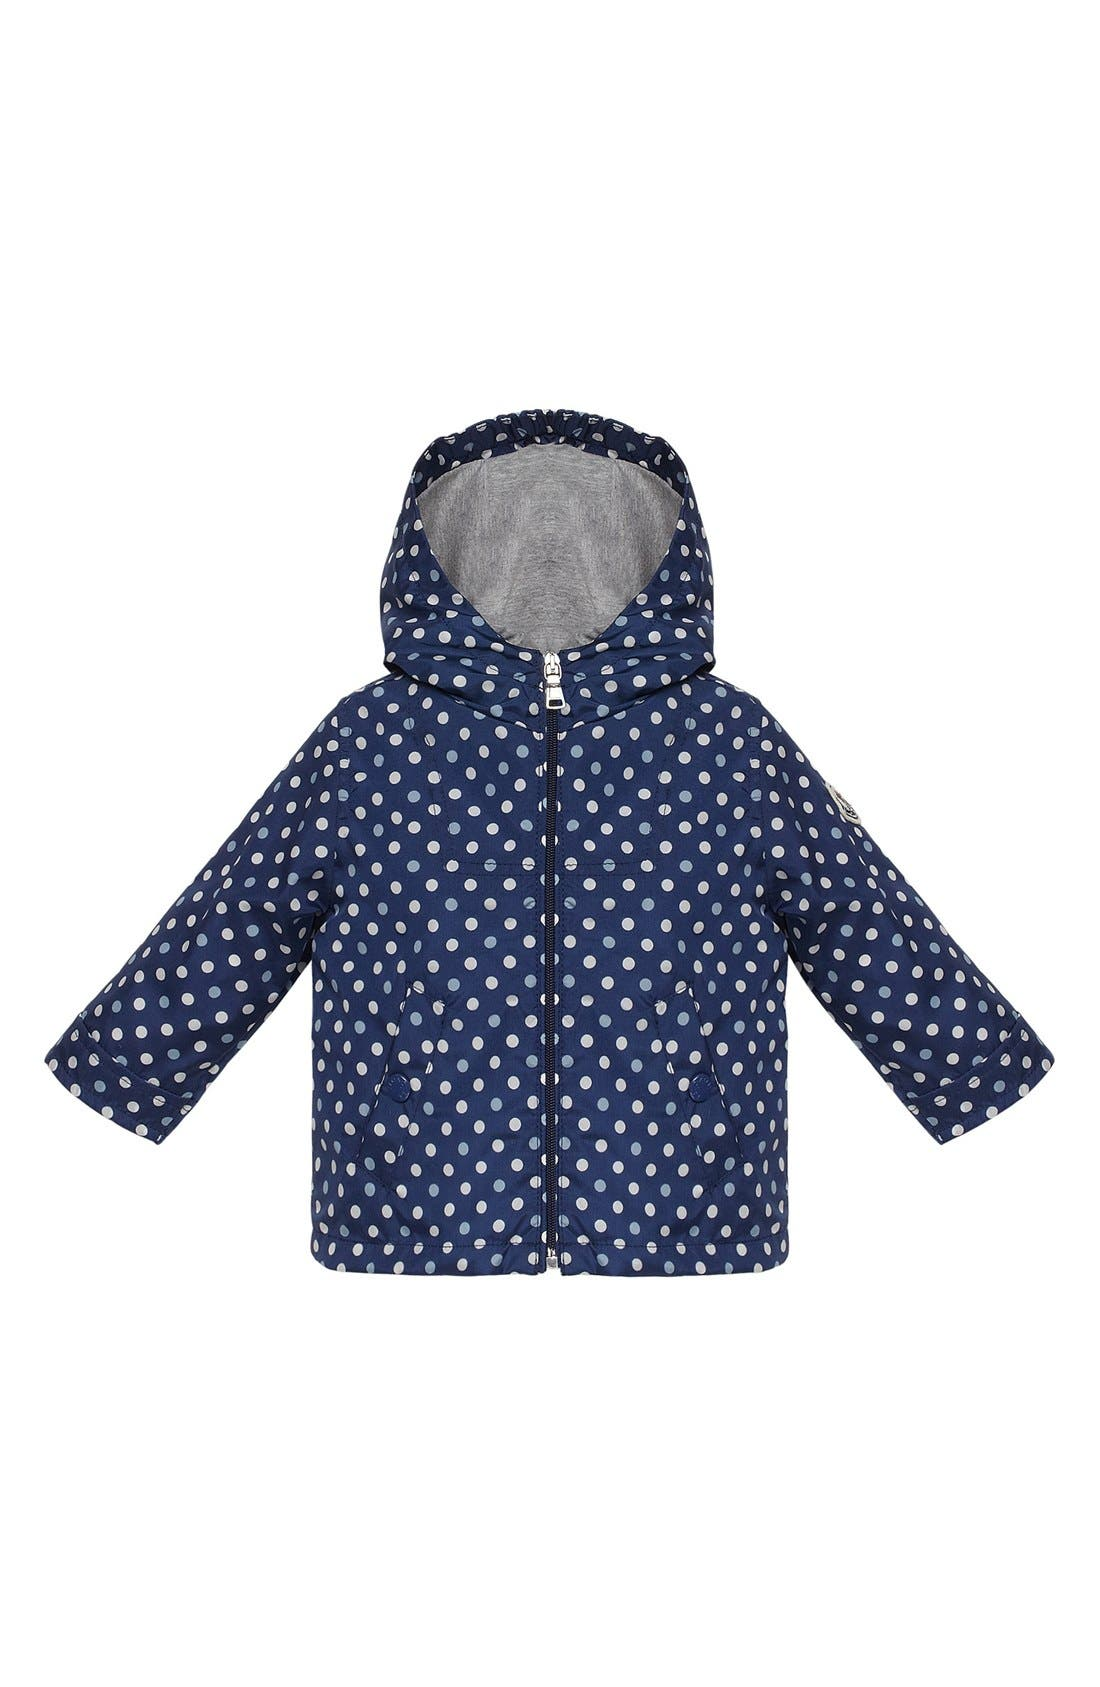 Alternate Image 1 Selected - Moncler Polka Dot Jacket (Toddler Girls)